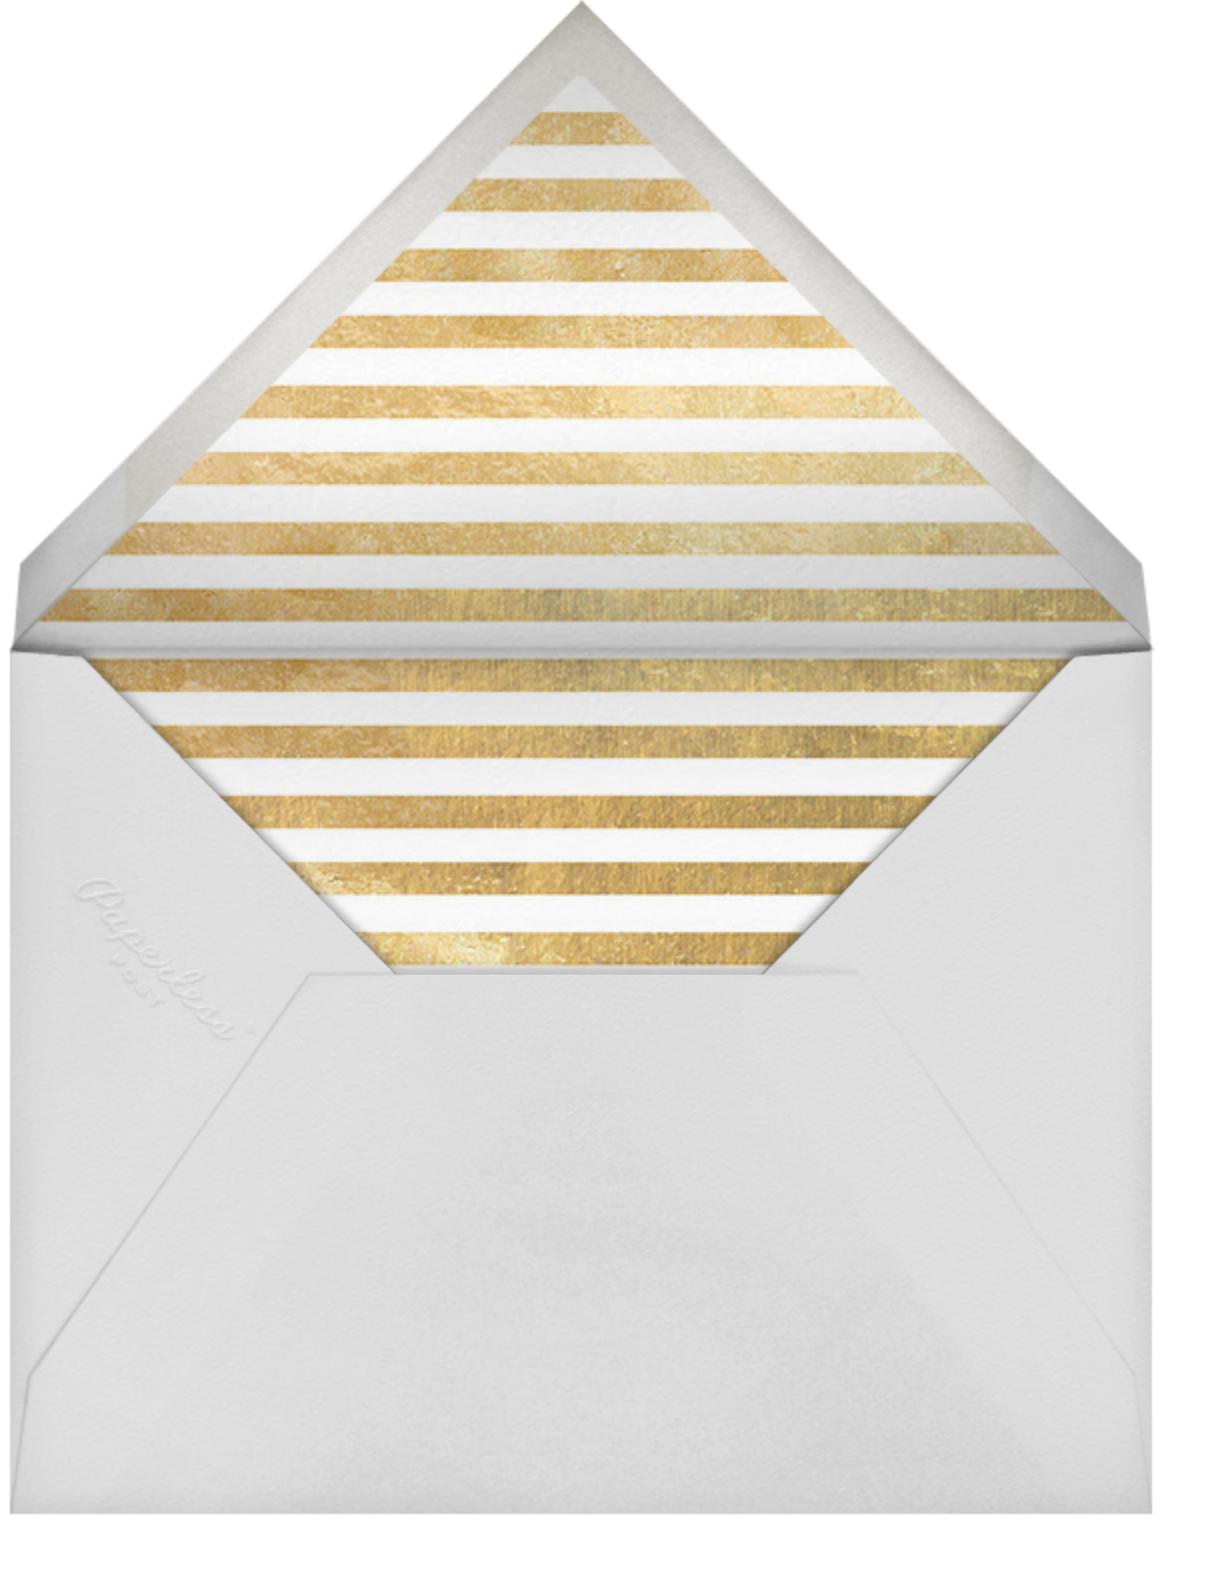 Black and Gold Heart - kate spade new york - null - envelope back